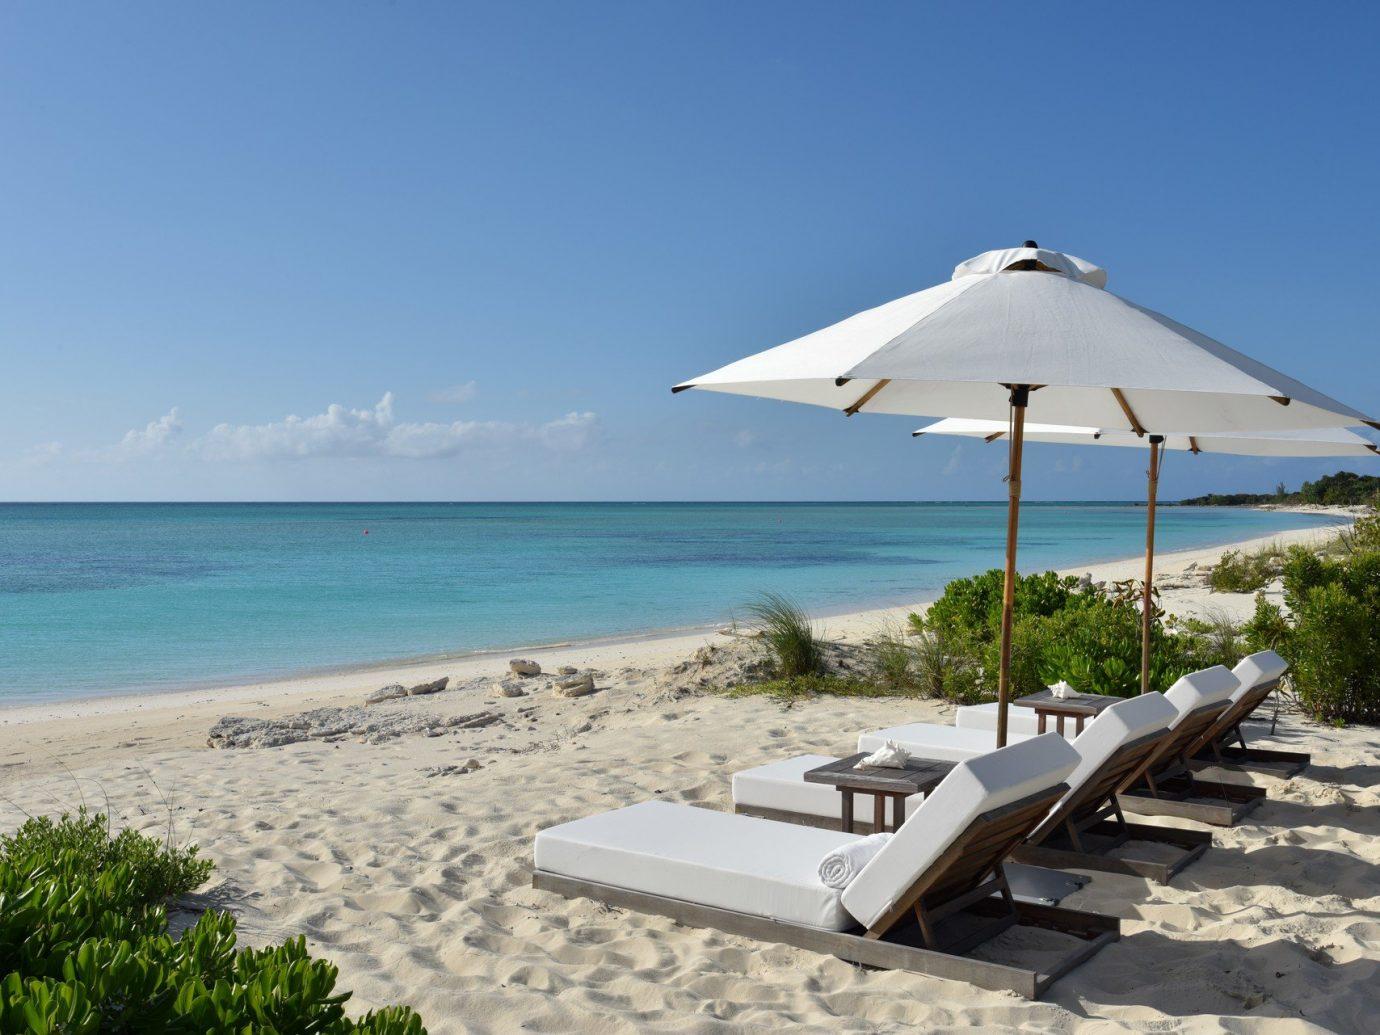 News Trip Ideas sky outdoor umbrella water Beach Nature chair Sea shore Ocean vacation Coast lawn caribbean cape bay Resort wind sandy shade day